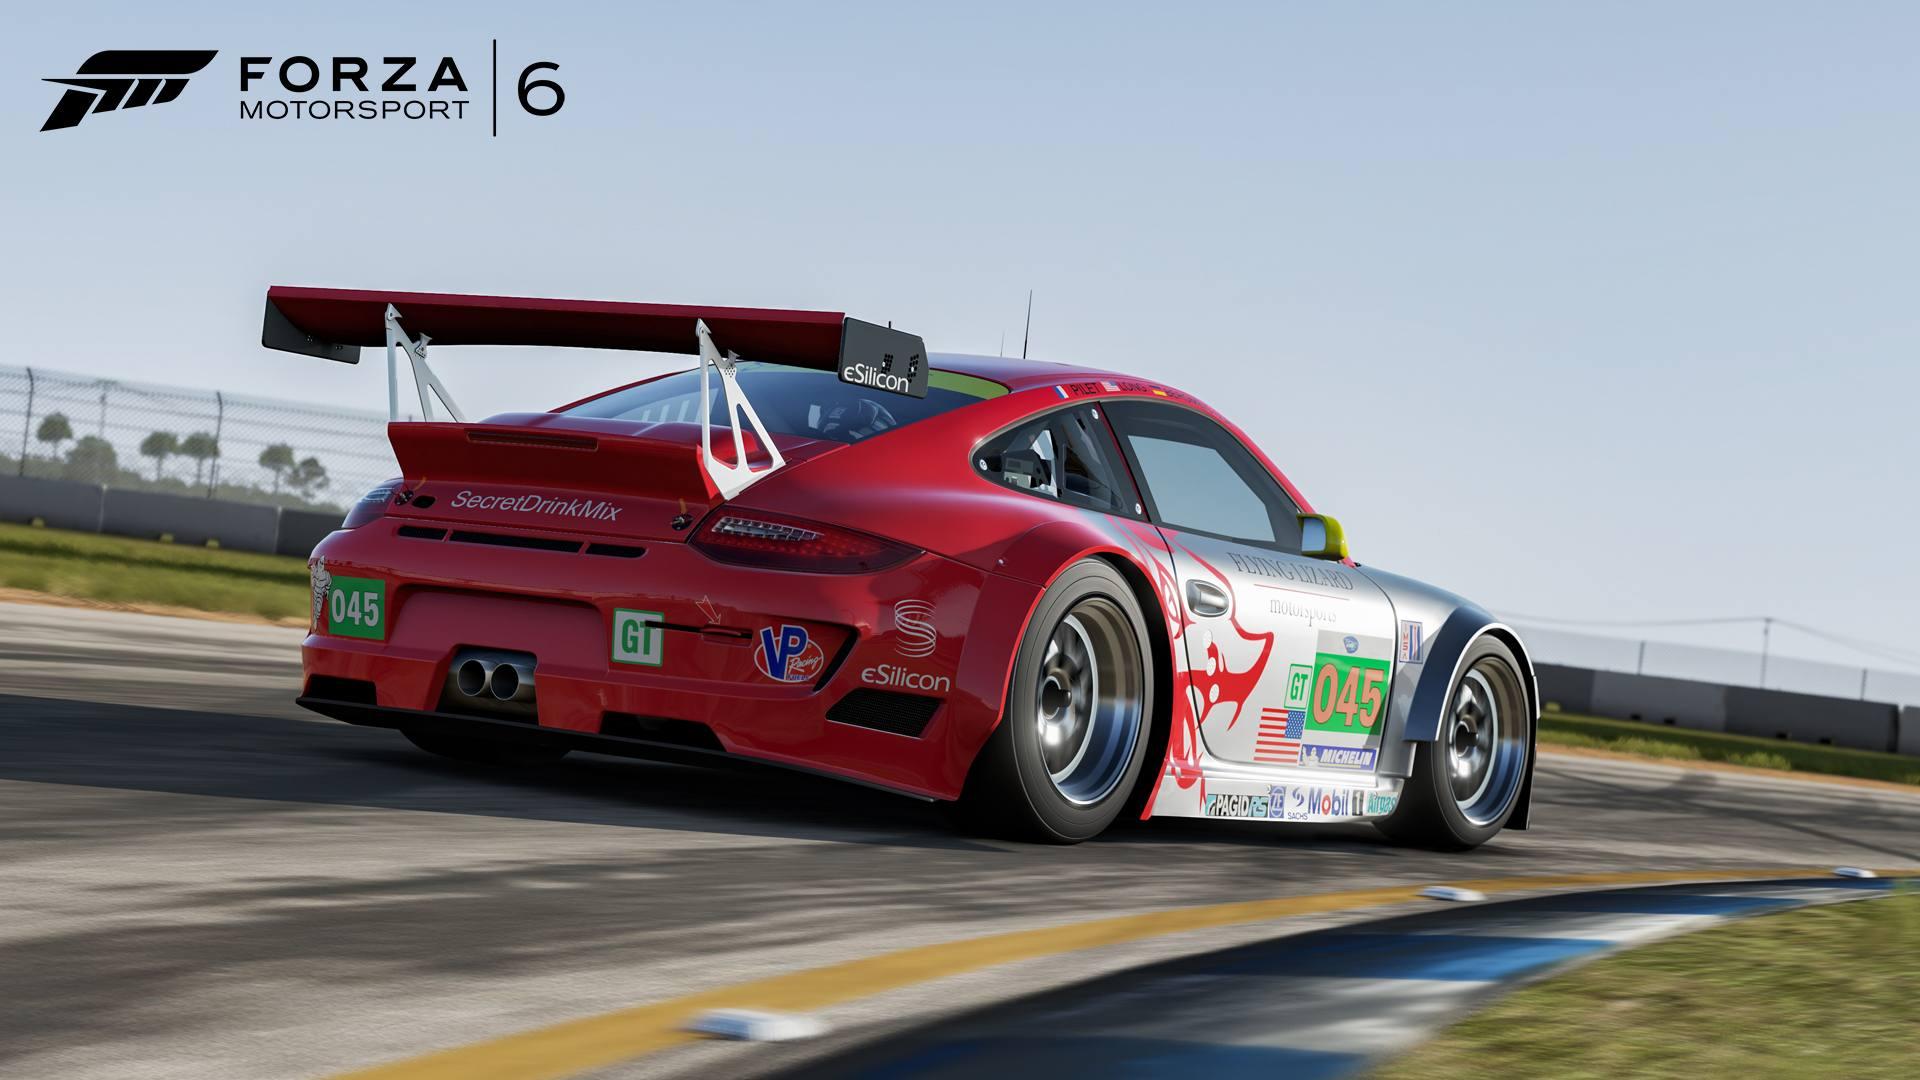 Forza Motorsport 6 01-03-16 2011 Porsche #45 Flying Lizard 911 GT3 RSR